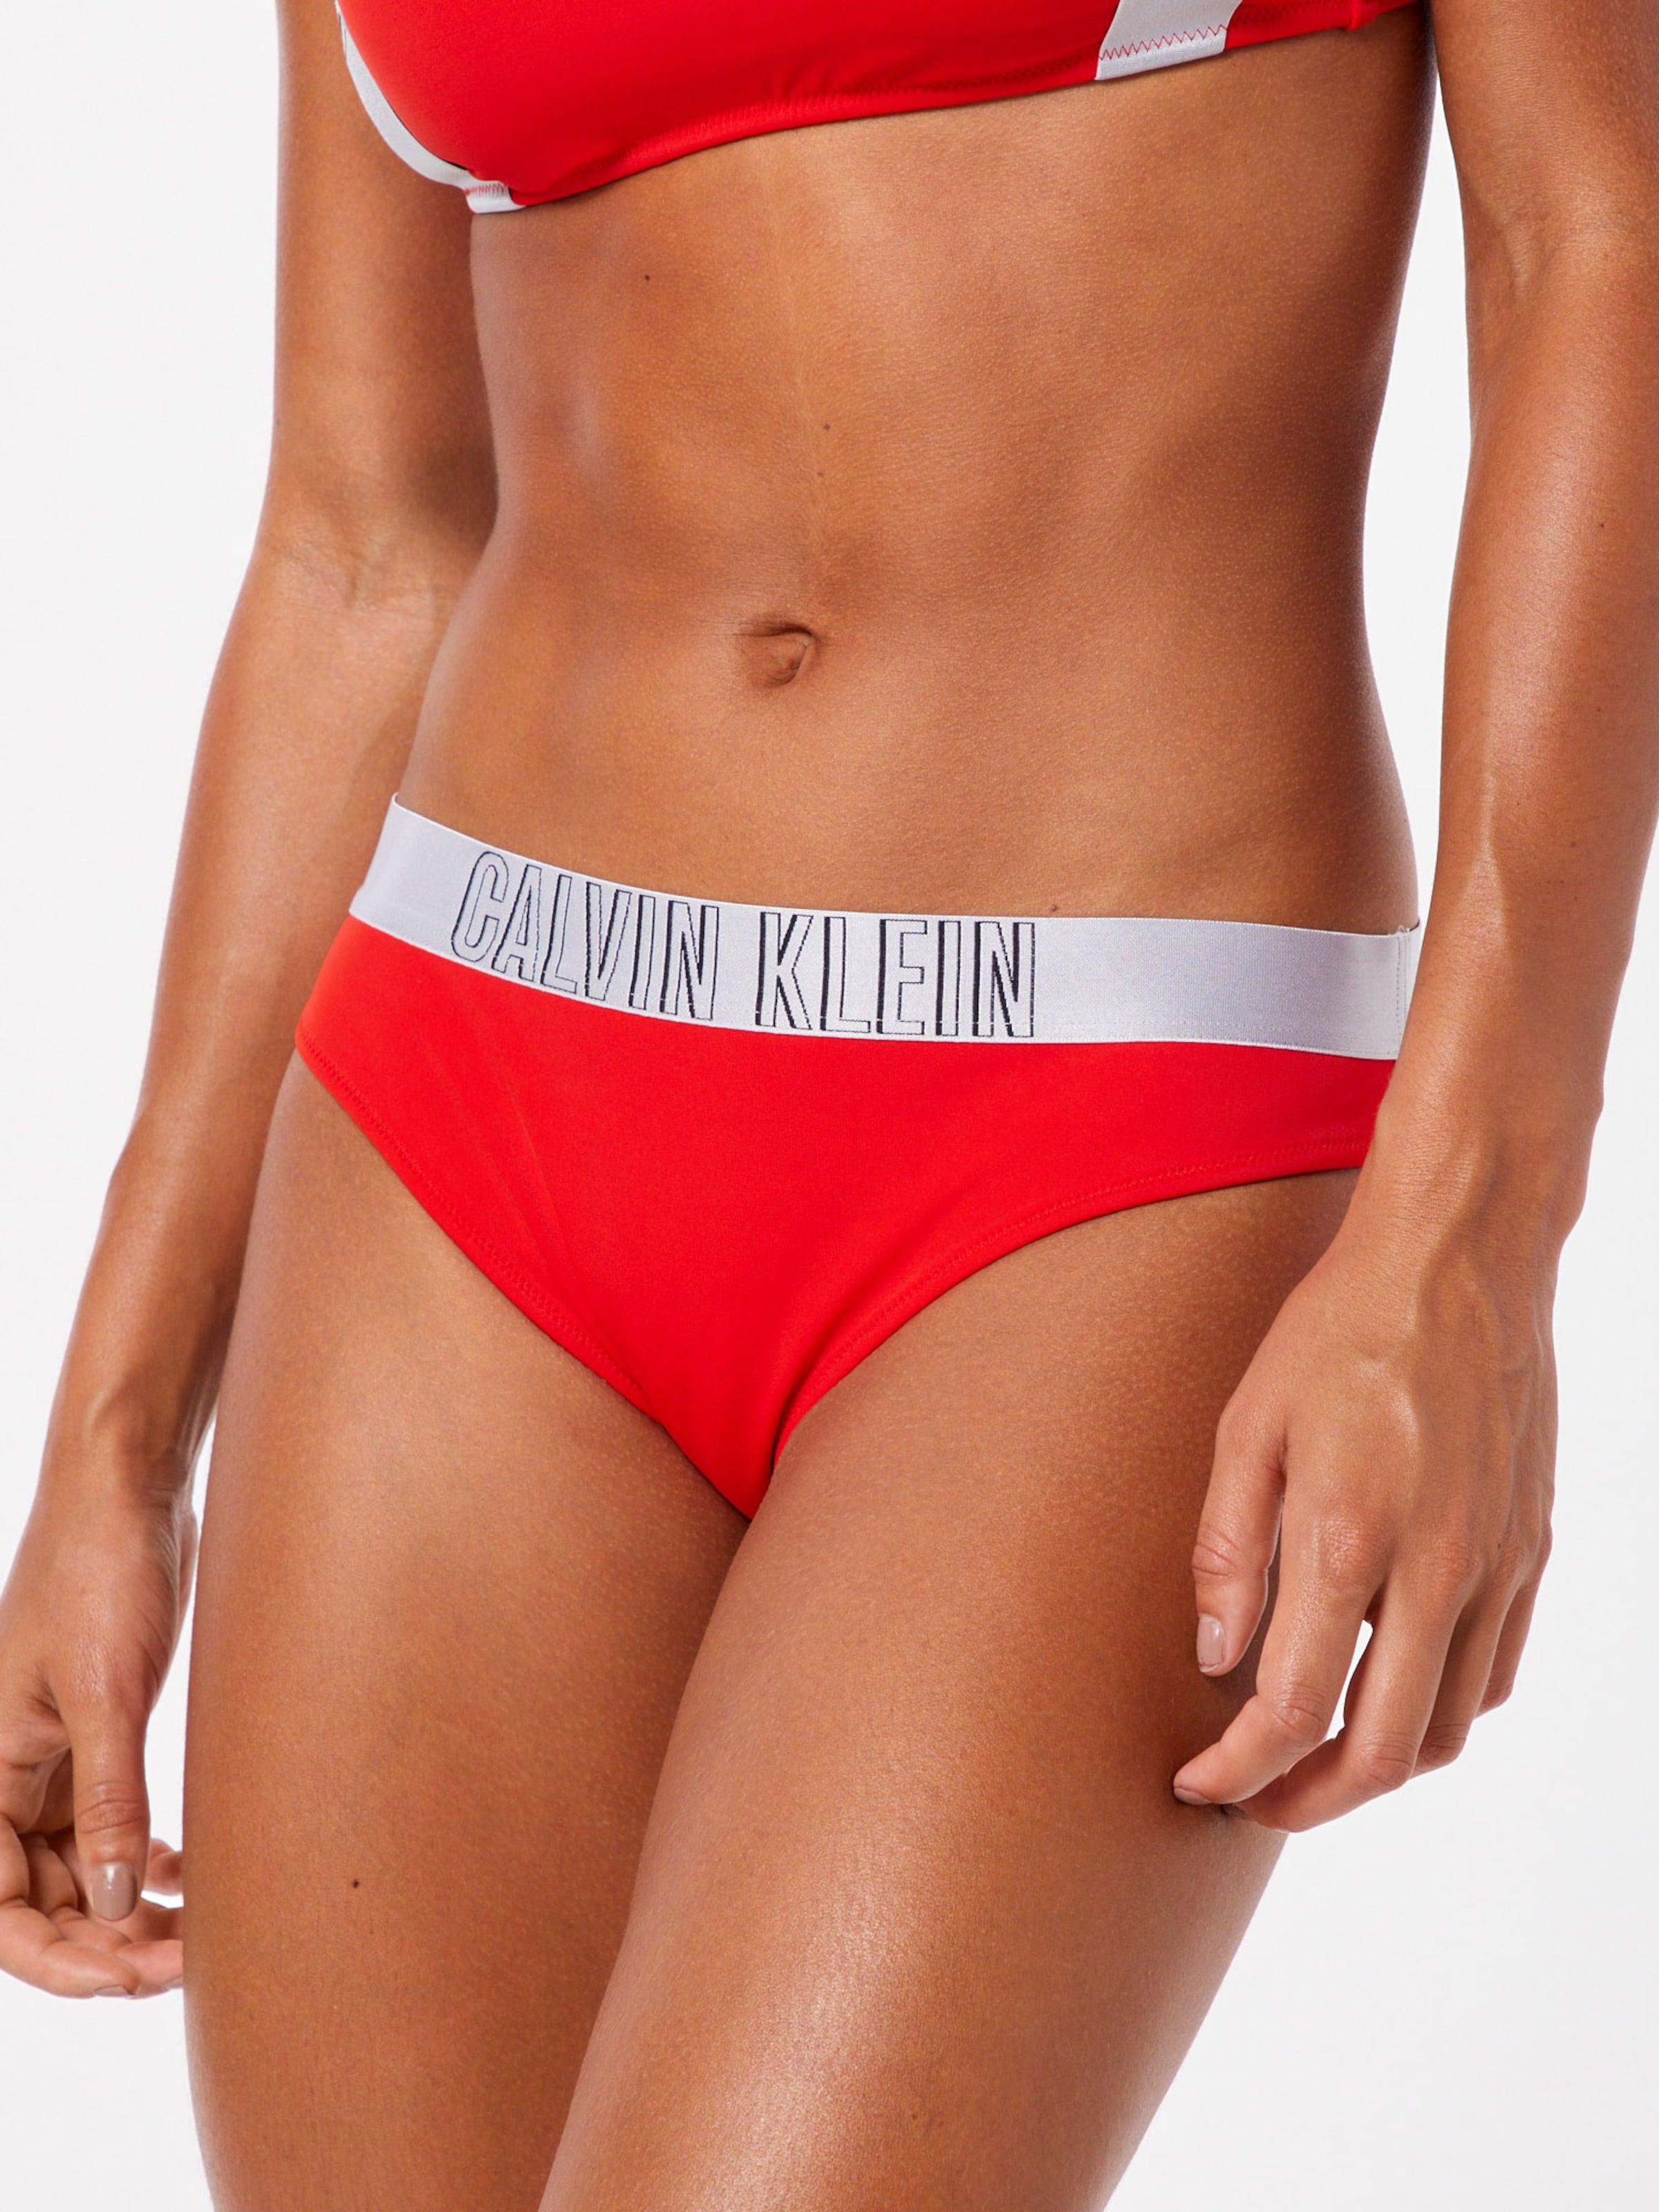 Klein In Calvin Bikinihose Swimwear RotWeiß cAqLj4S3R5